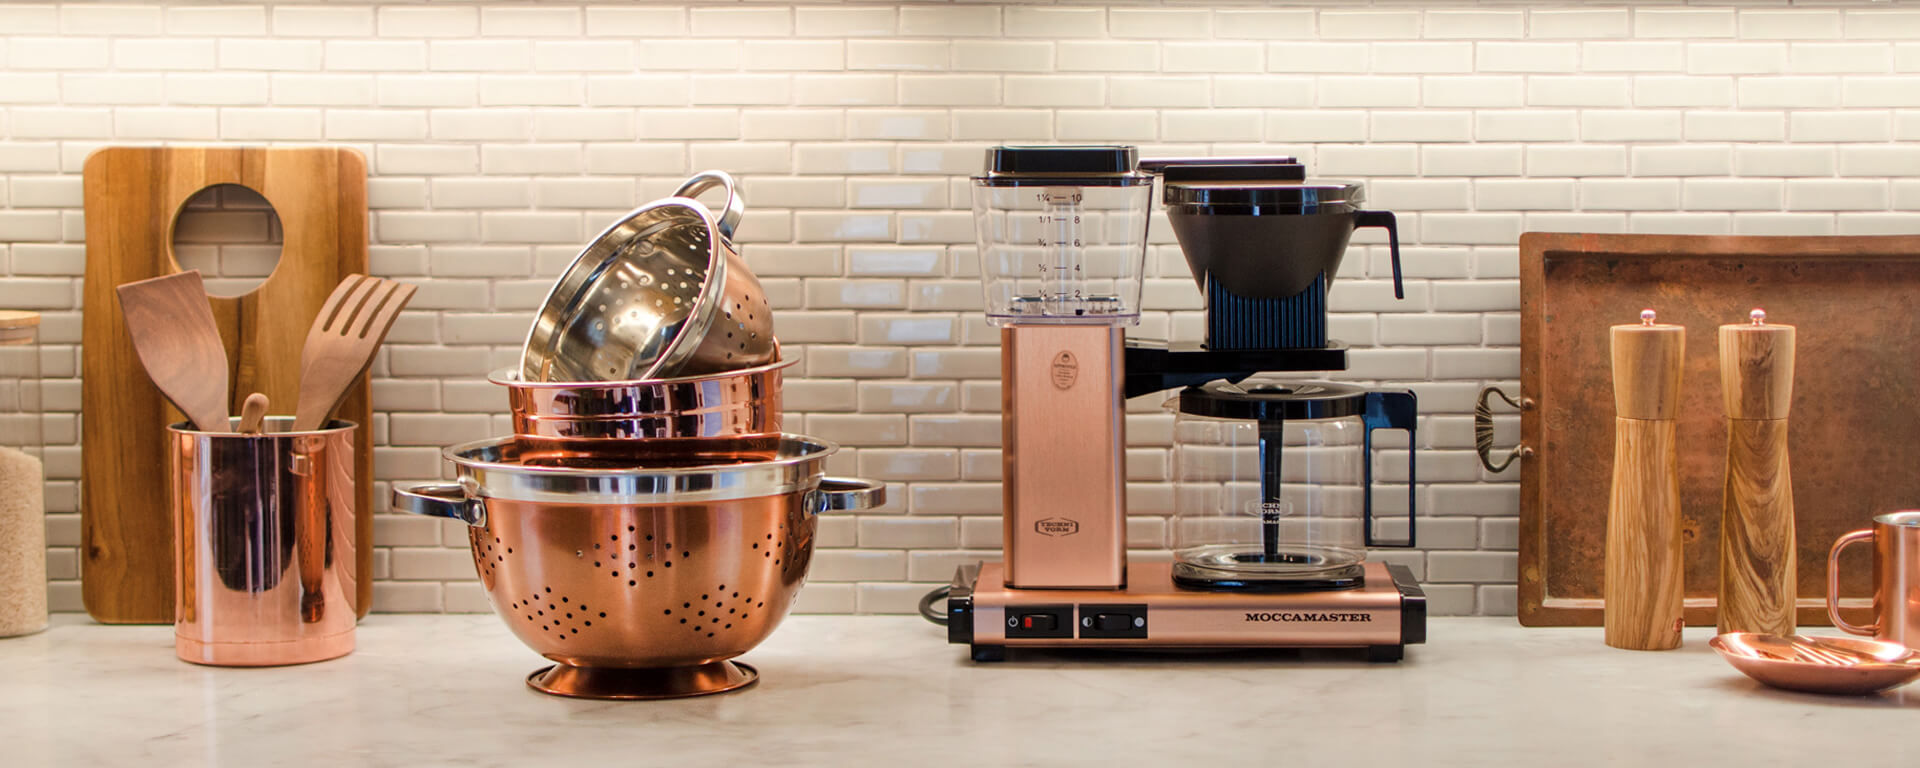 Moccamaster Select Copper in der Küche